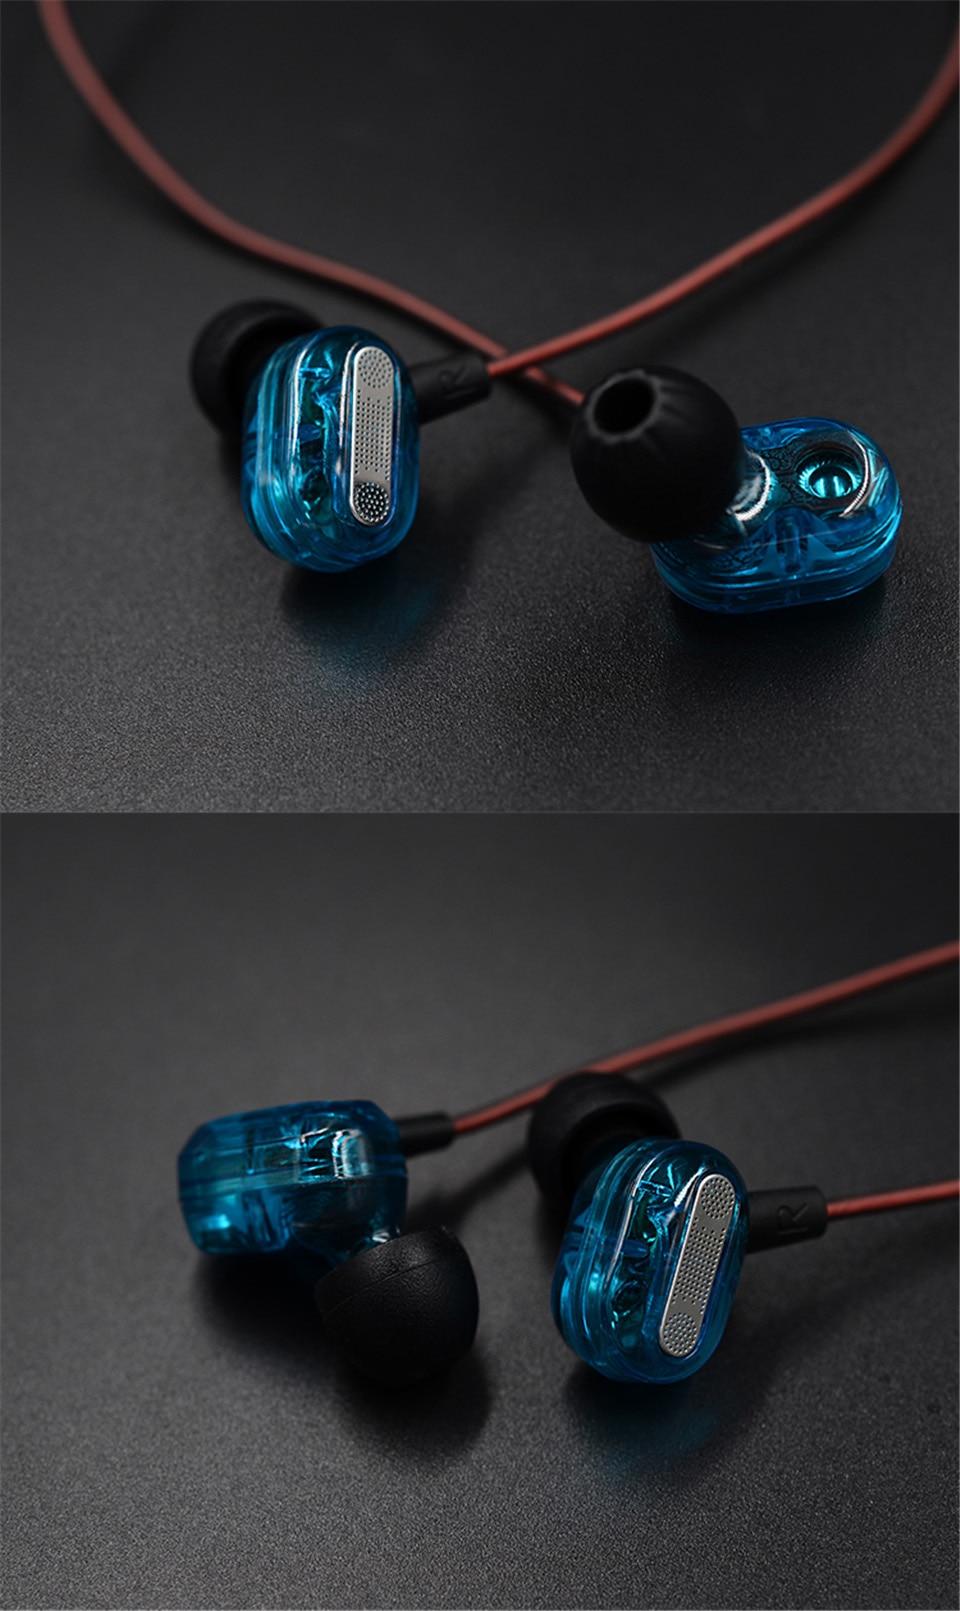 KZ_ZSE_Special_Dynamic_Dual_Driver_Earphone_In_Ear_Gaming_Headset_Audio_Monitors_Headphone_HiFi_Music_Sports_Blue_Earbuds (12)